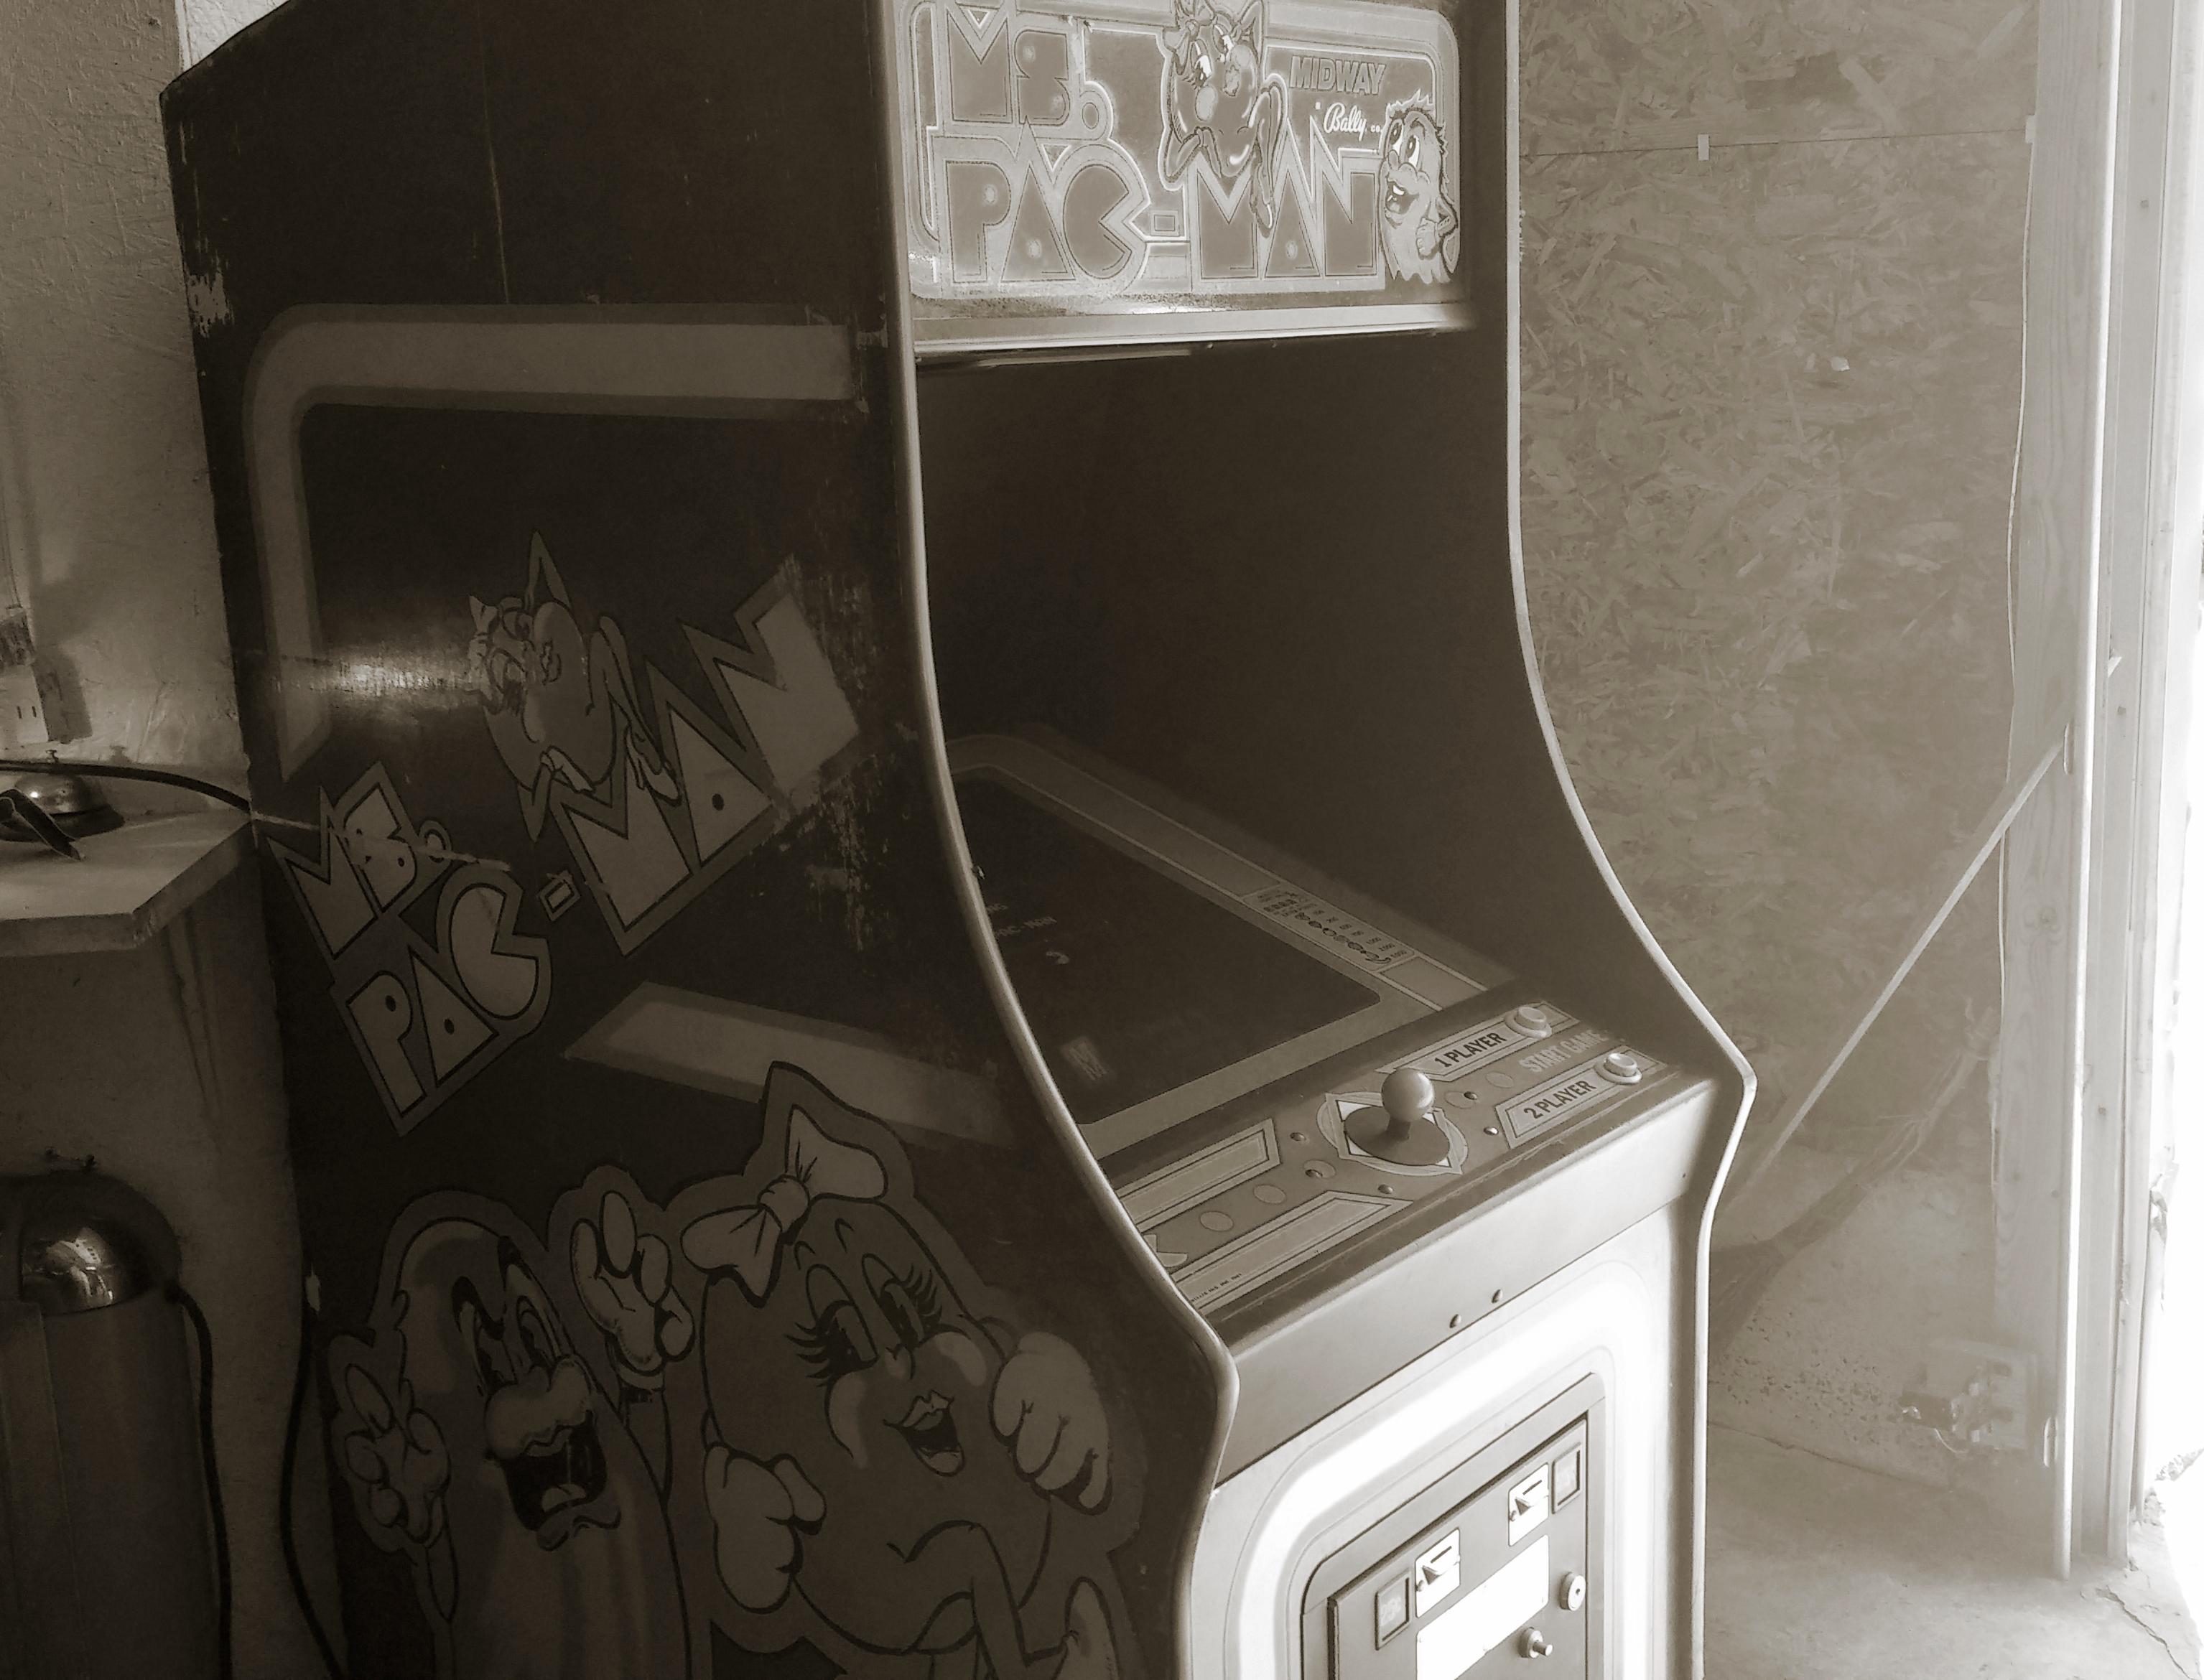 A Pacman machine